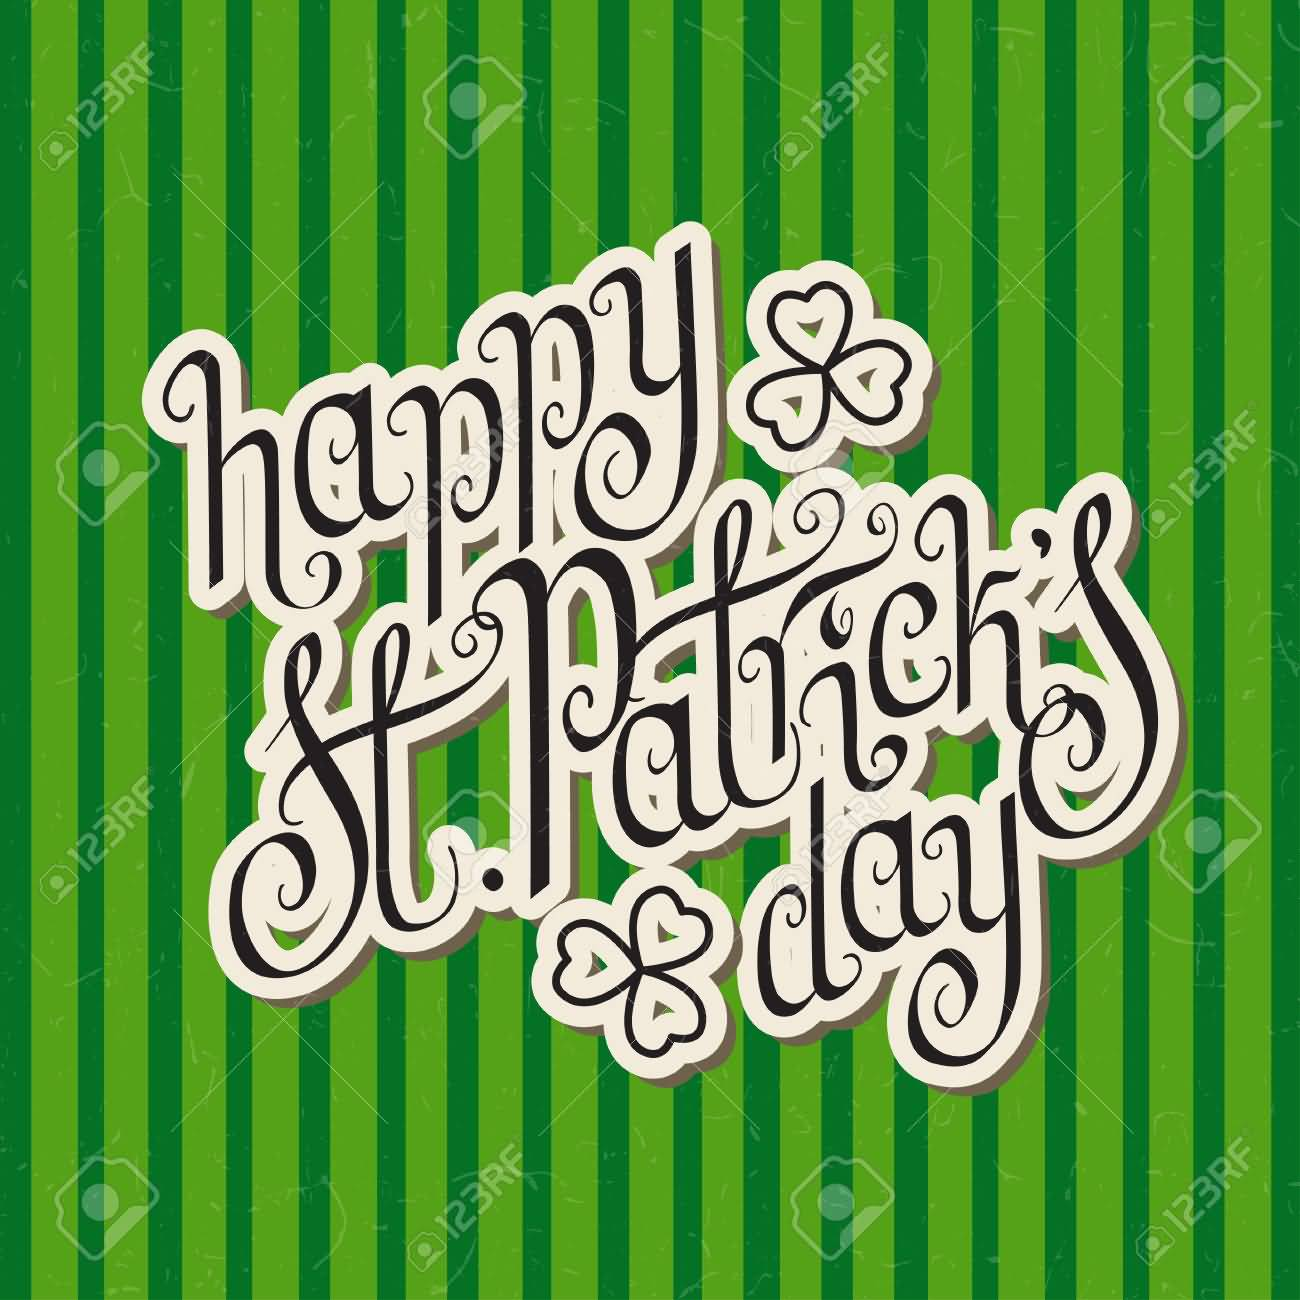 Happy Saint Patricku0027s Day 2017 Ecard